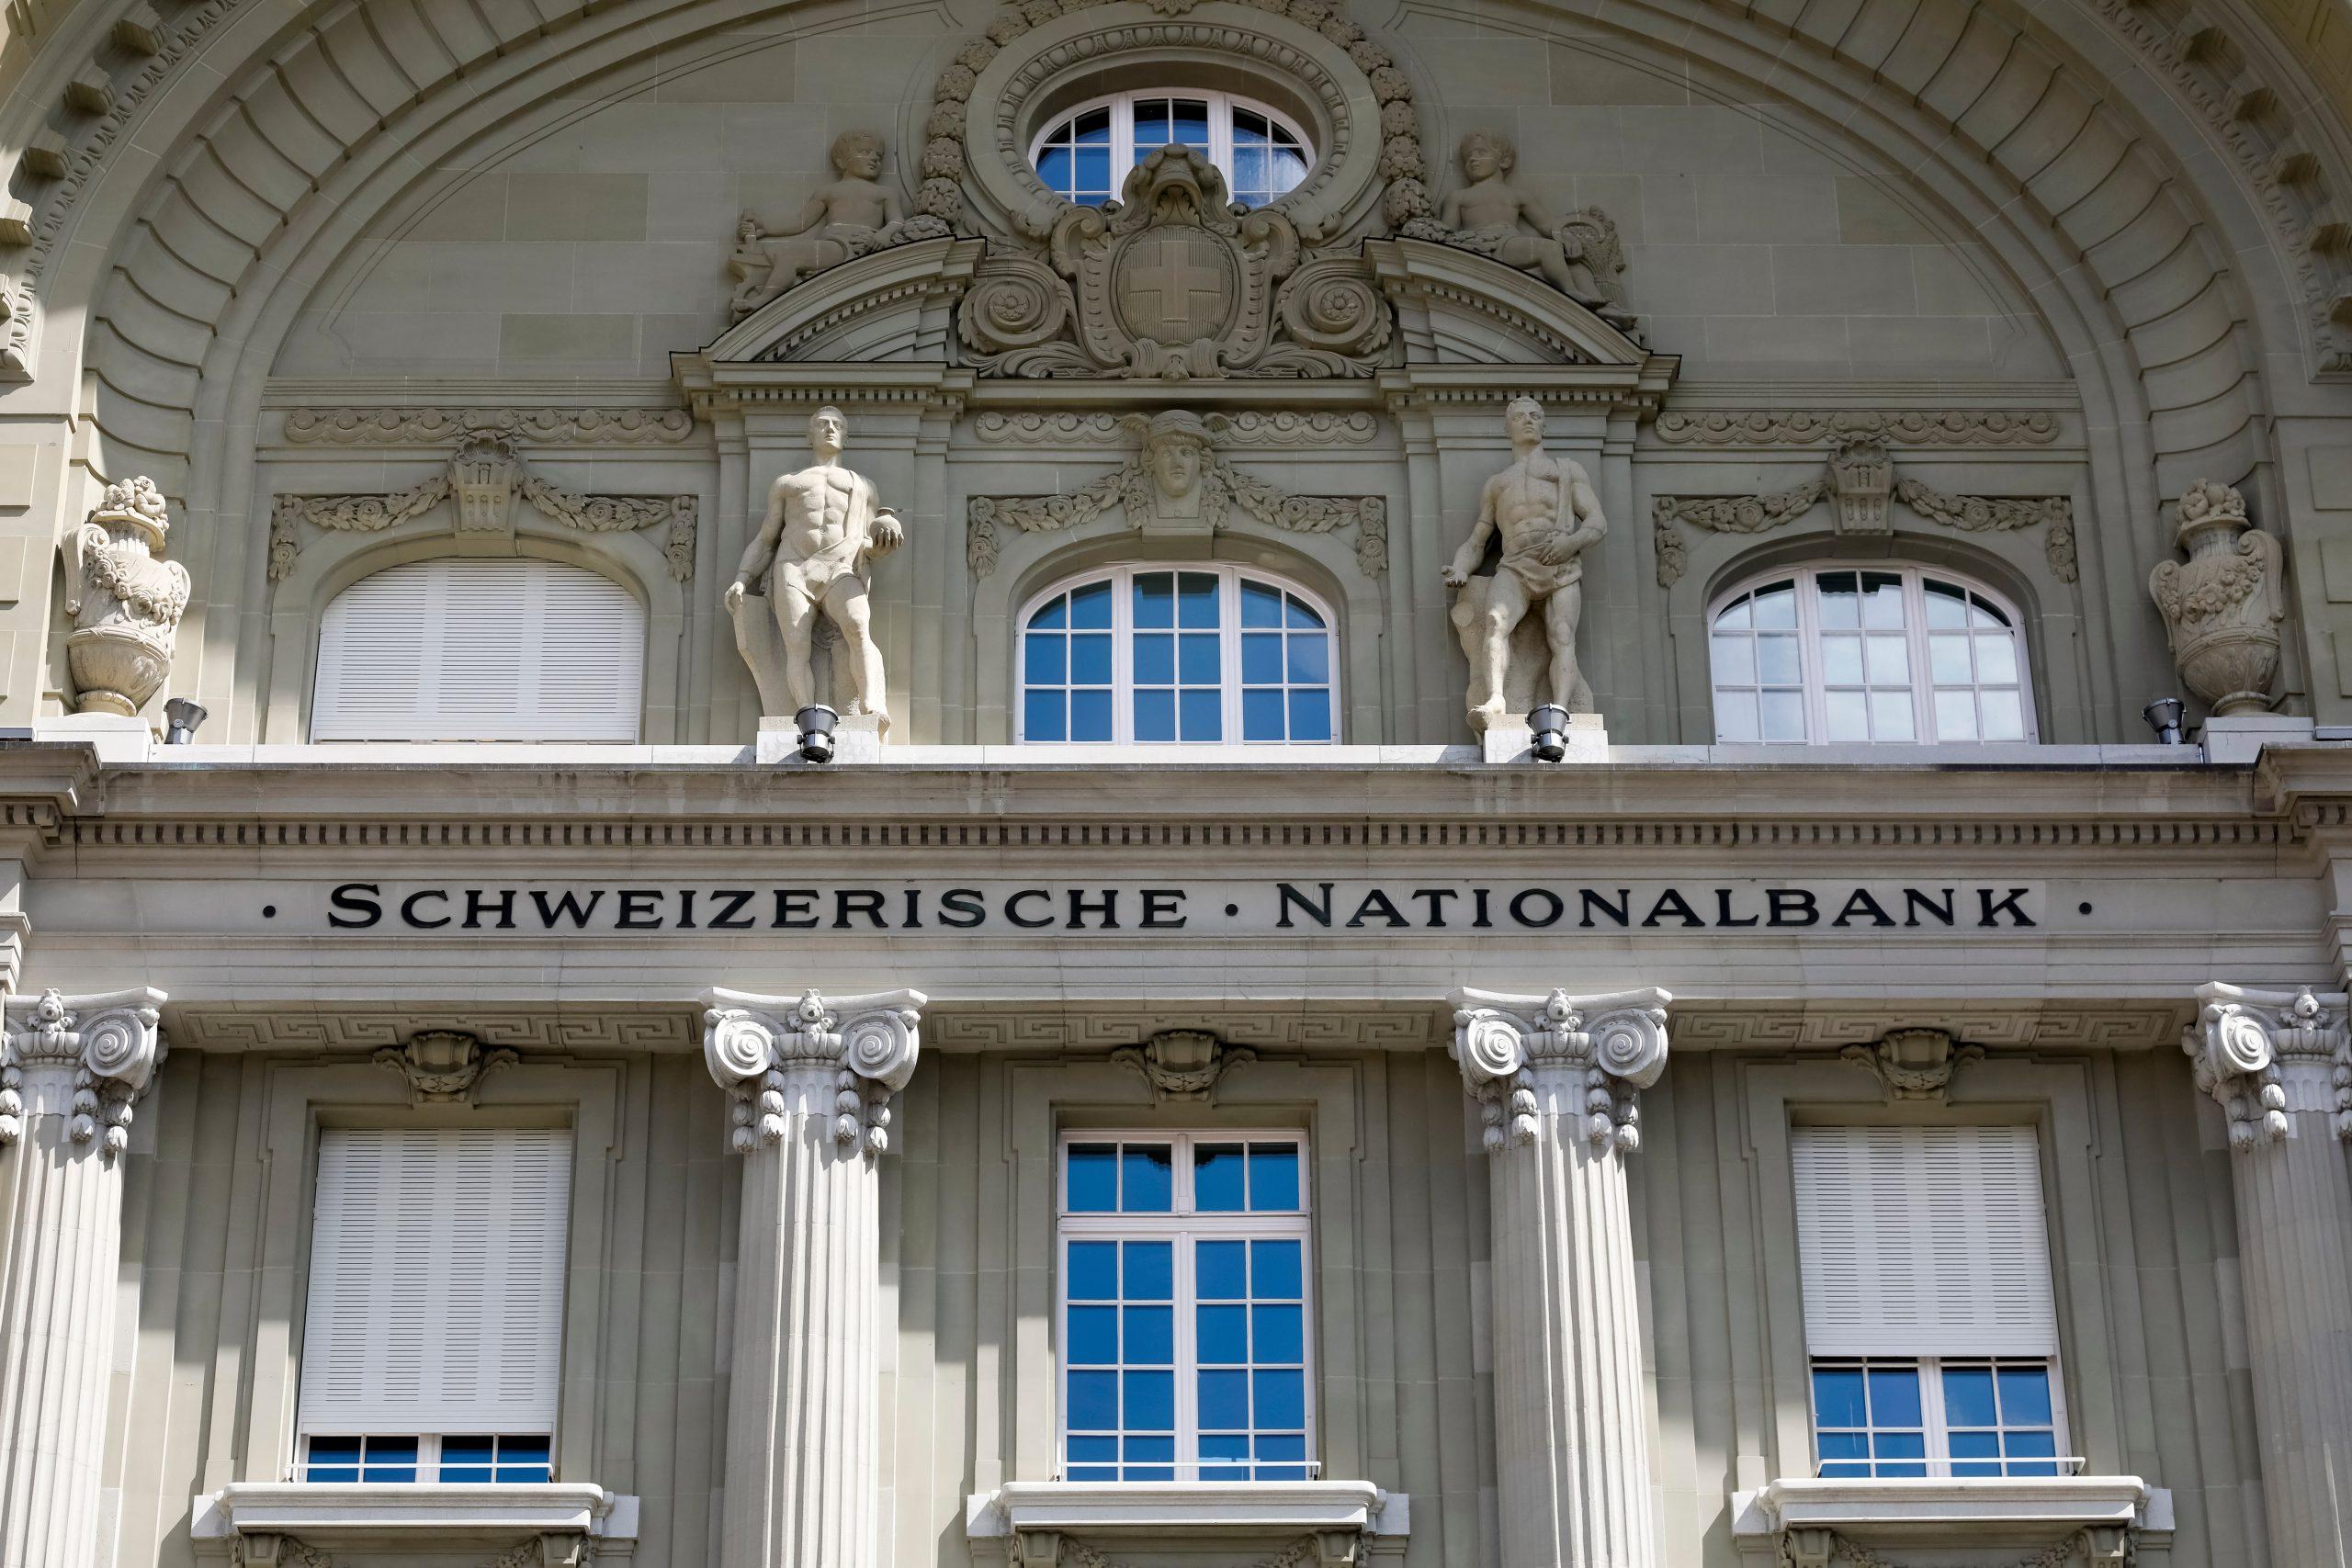 Gut gelaunte Finanzmärkte bescheren SNB einen Gewinn von 20,9 Mrd. Fr.